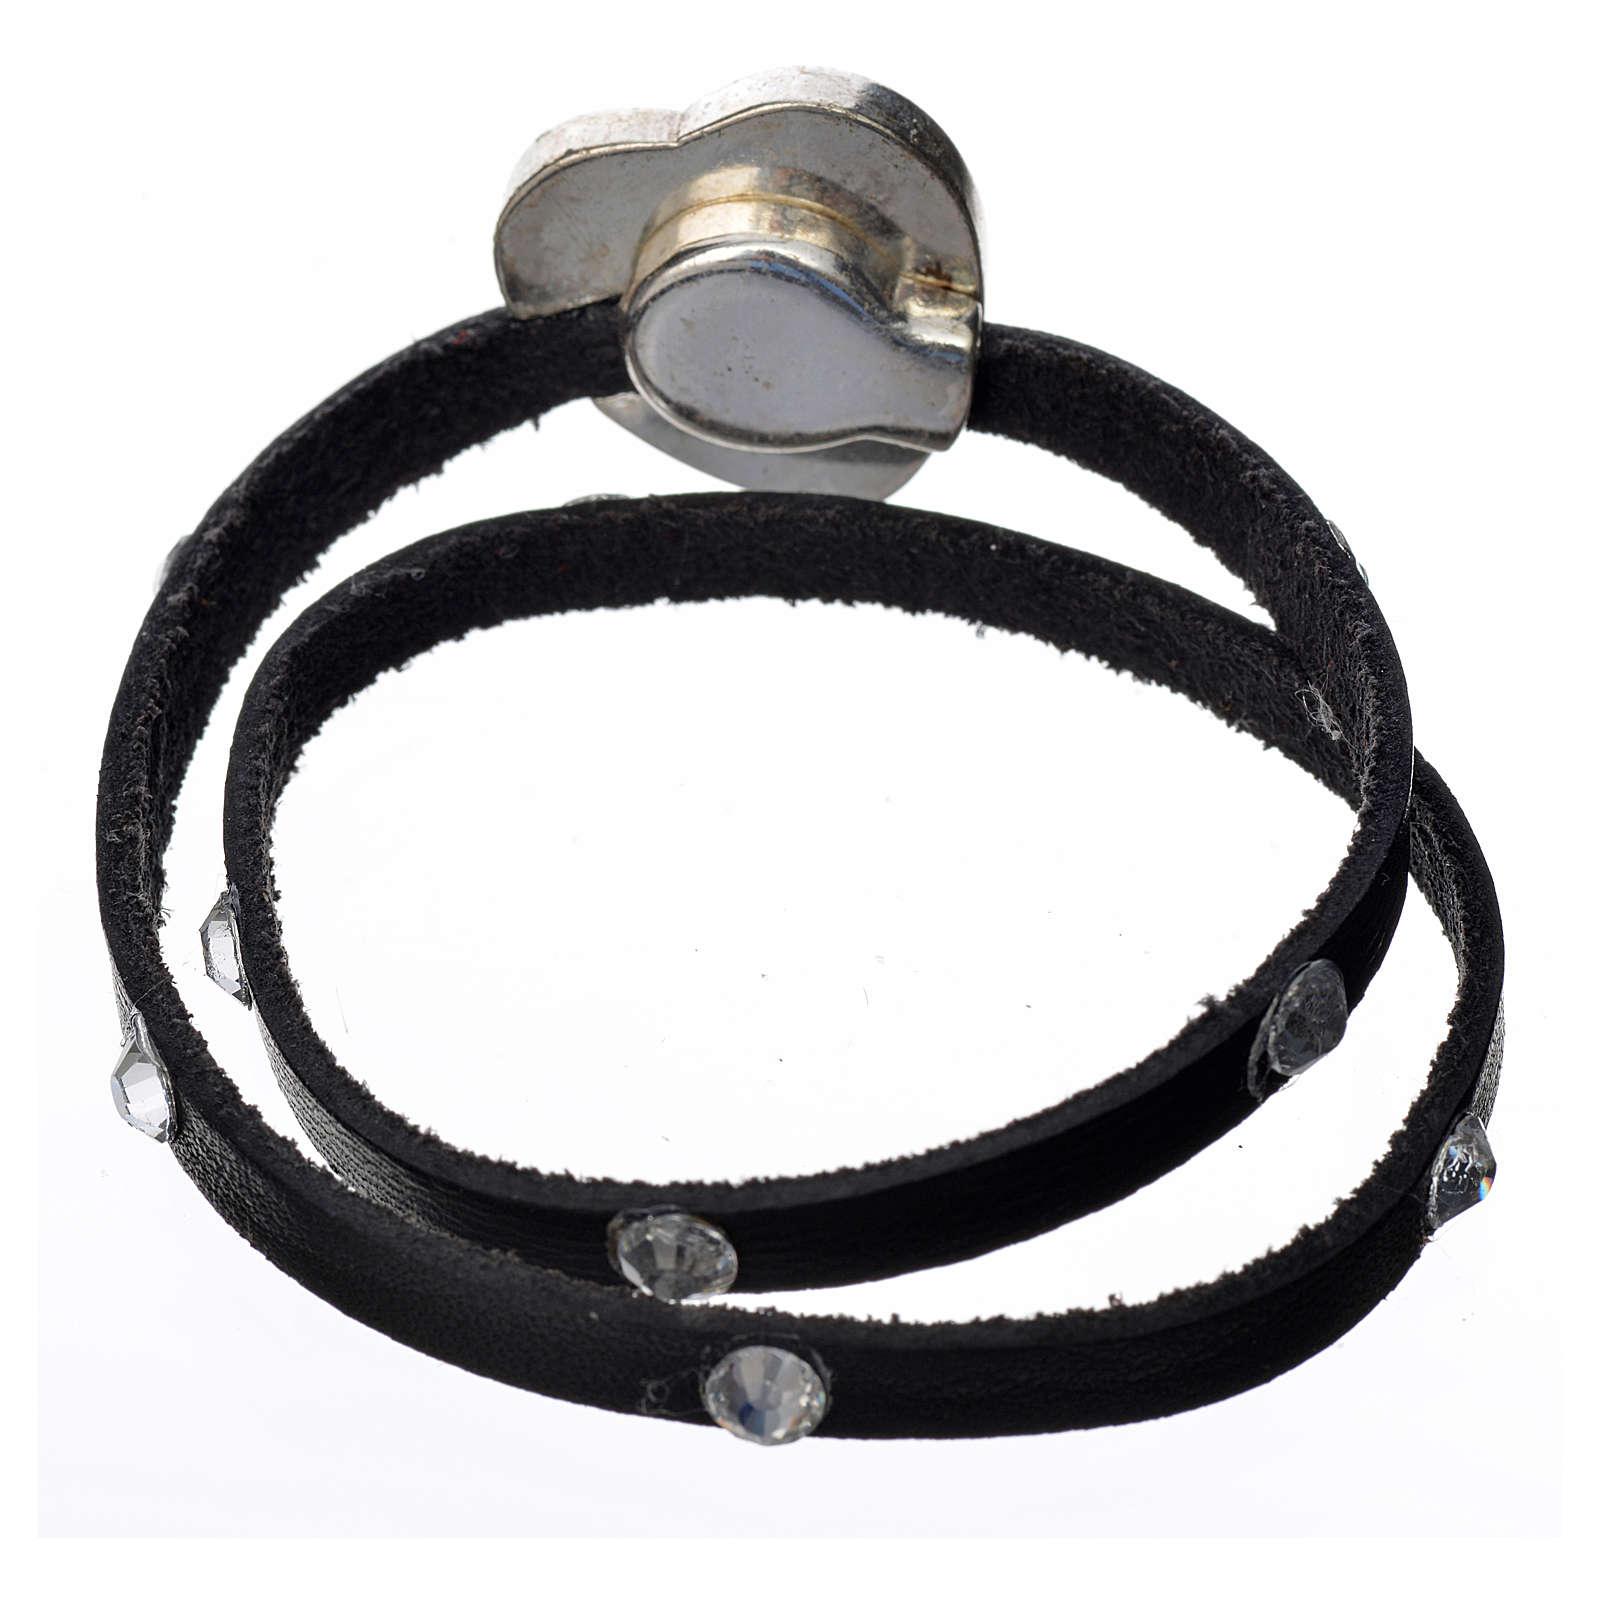 Bracelet cuir noir et Swarovski image Vierge Marie 4